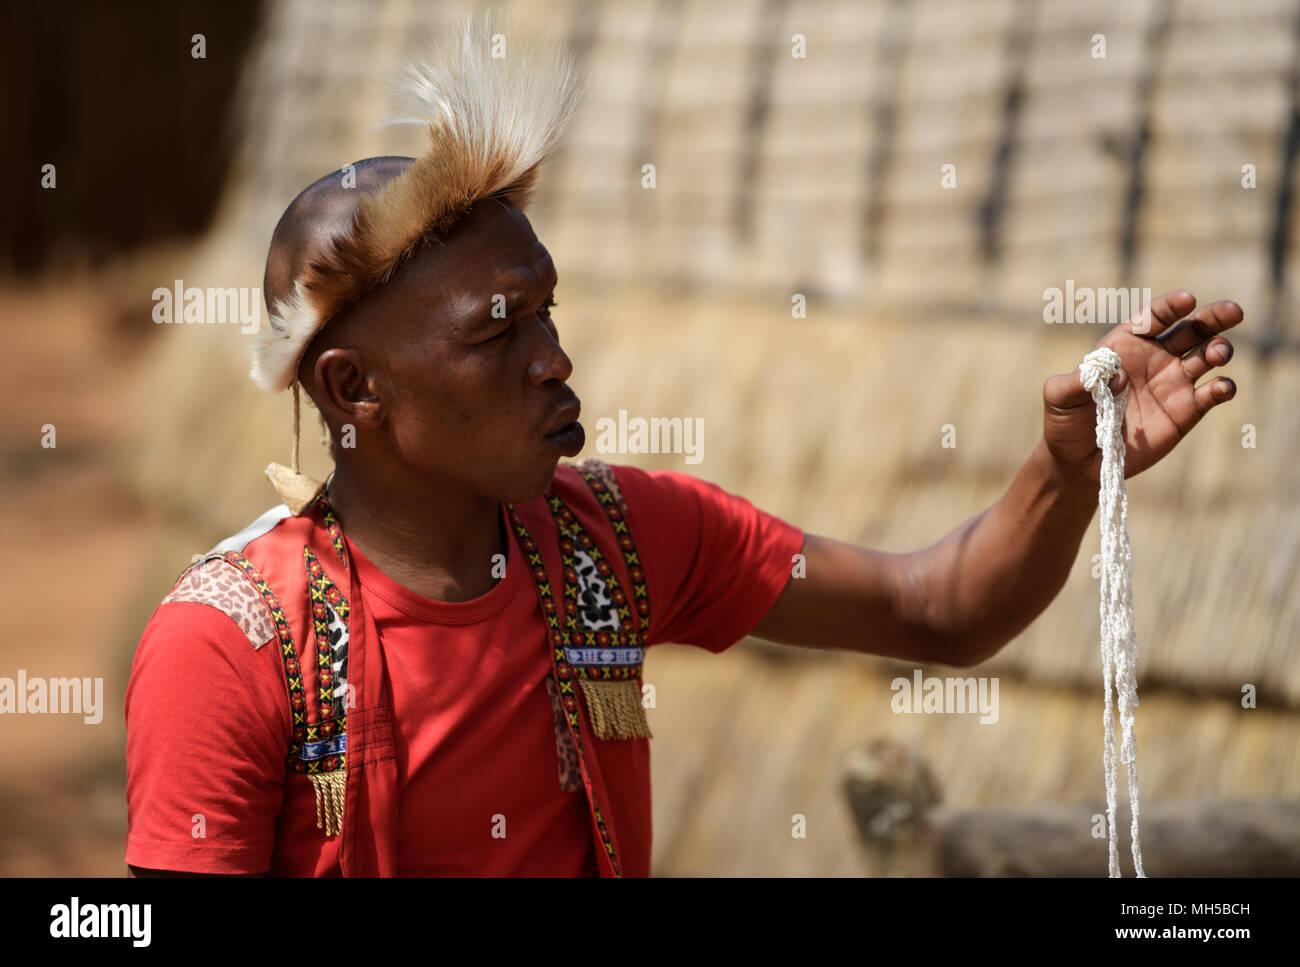 Eshowe, KwaZulu-Natal, South Africa, single young man in traditional Zulu dress explaining cultural customs of beadwork at Shakaland theme village Stock Photo